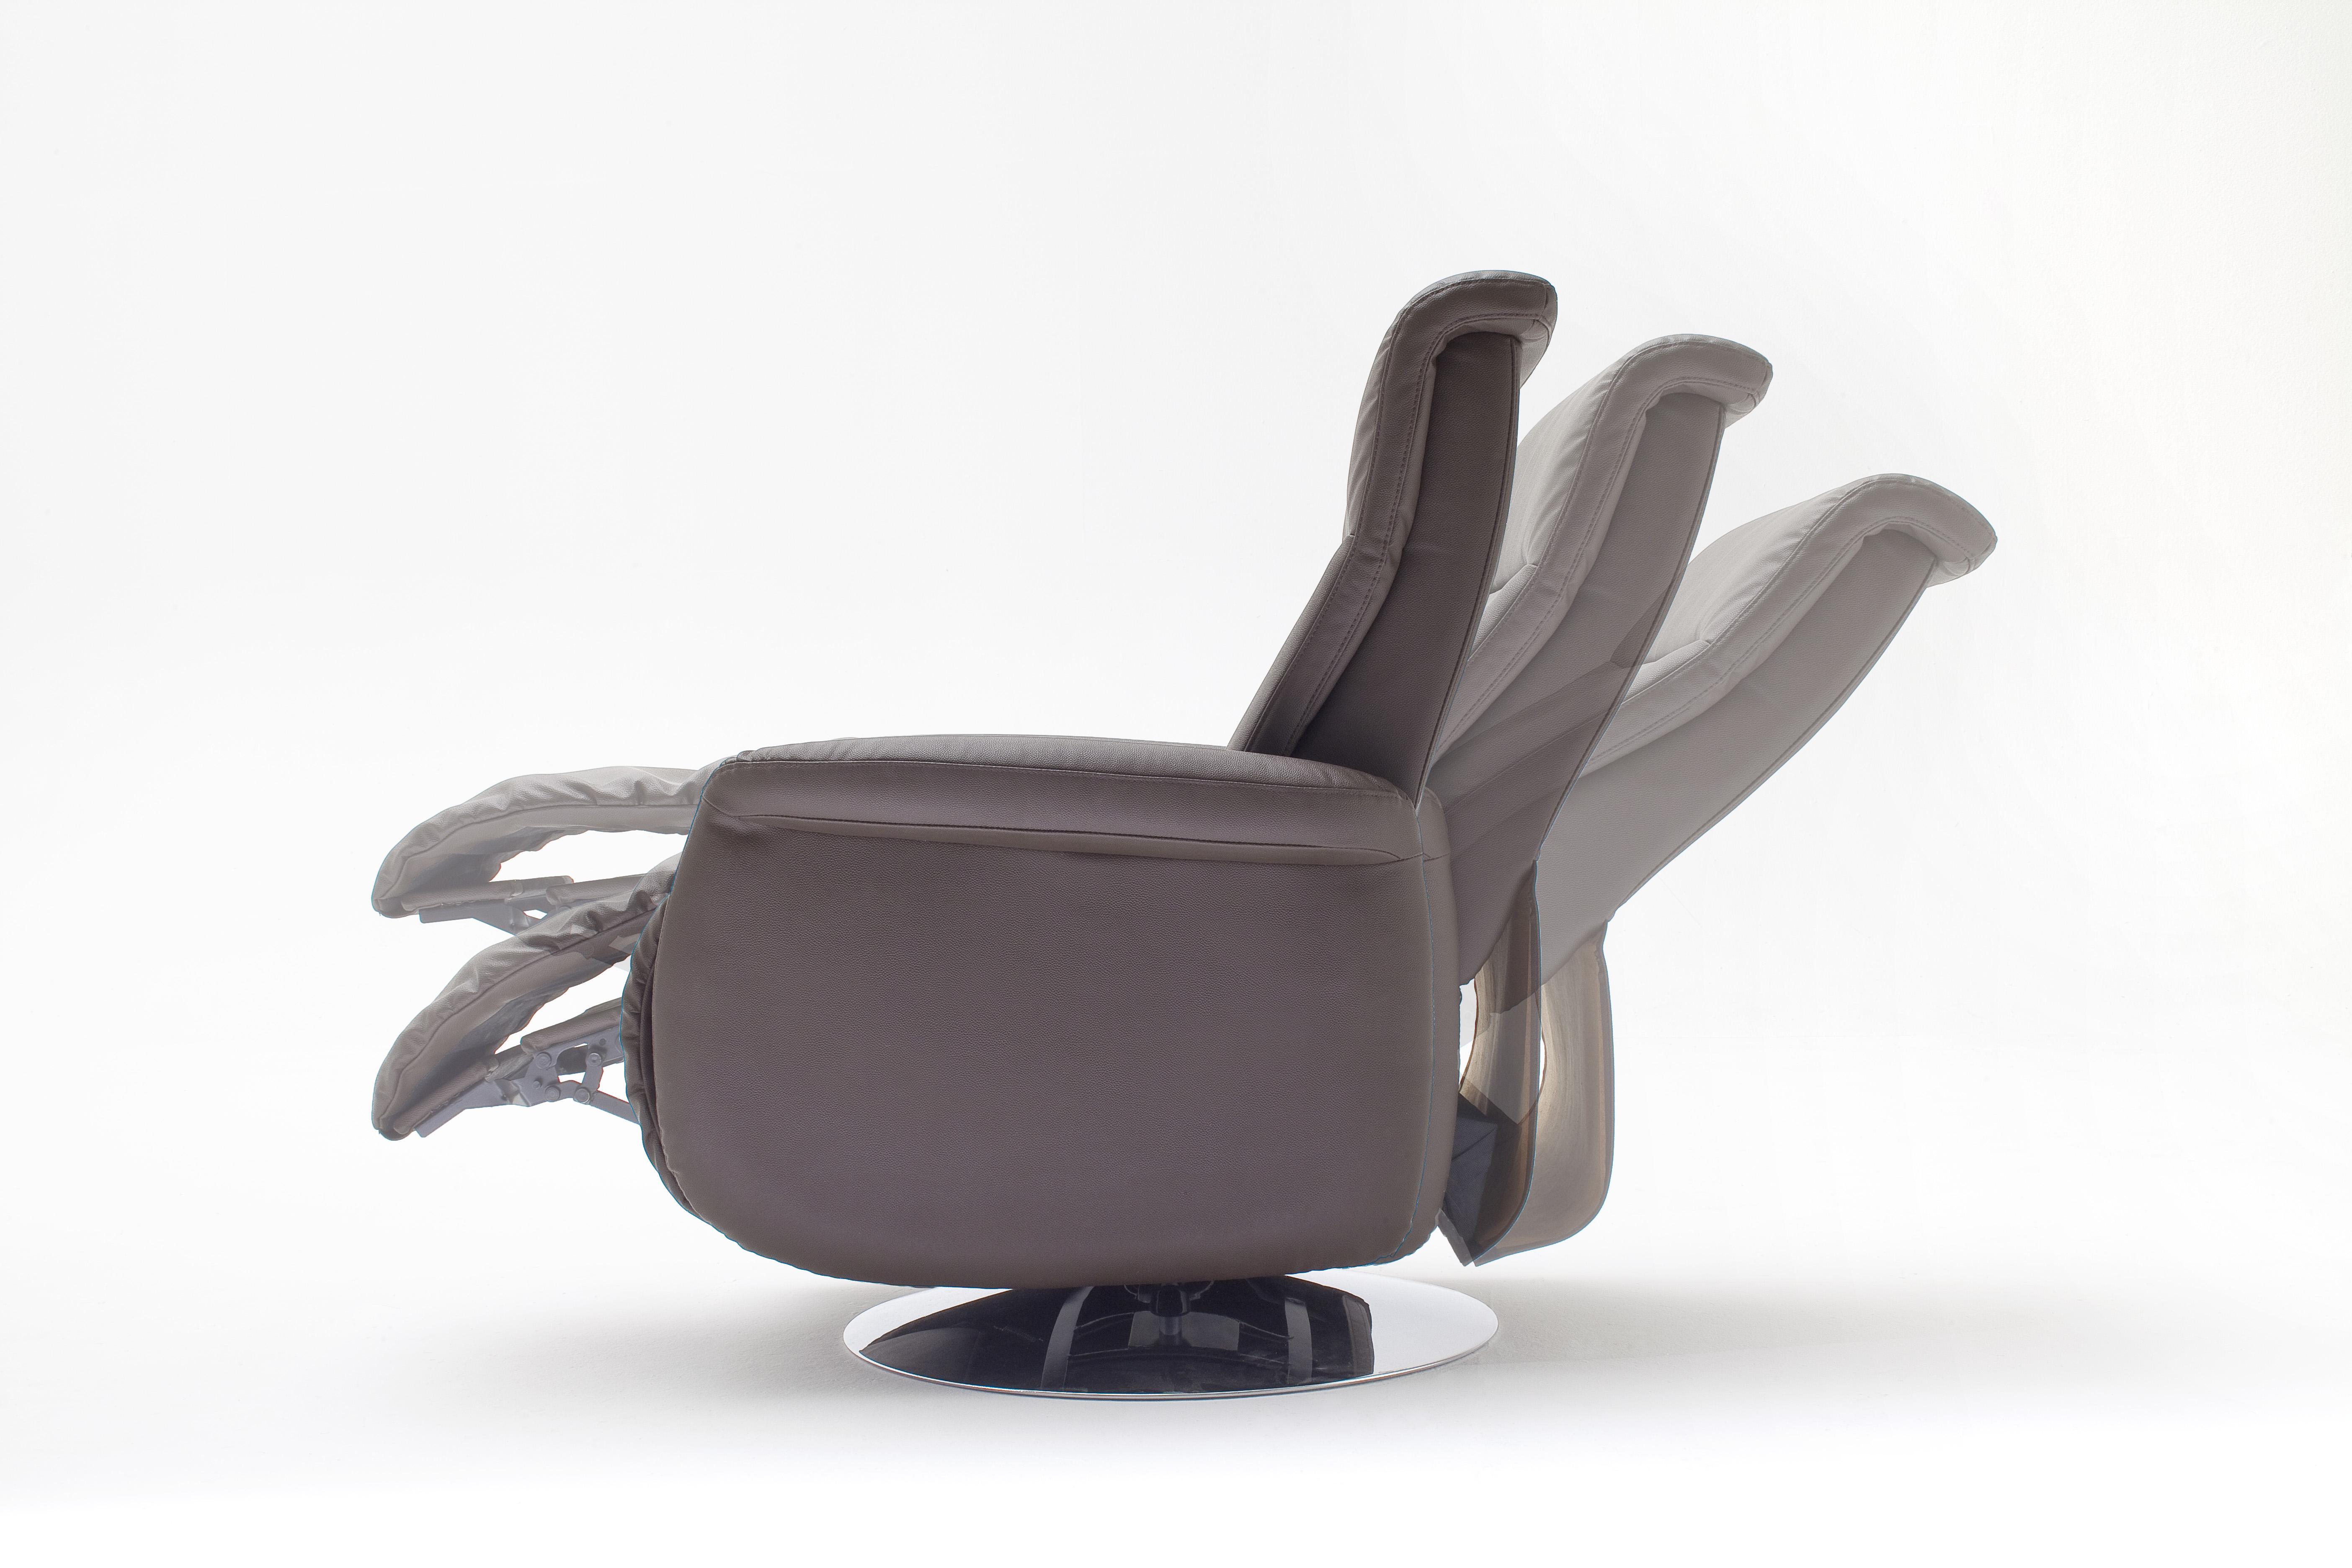 Marra Relaxsessel Rindsleder mit PVC Schwarz